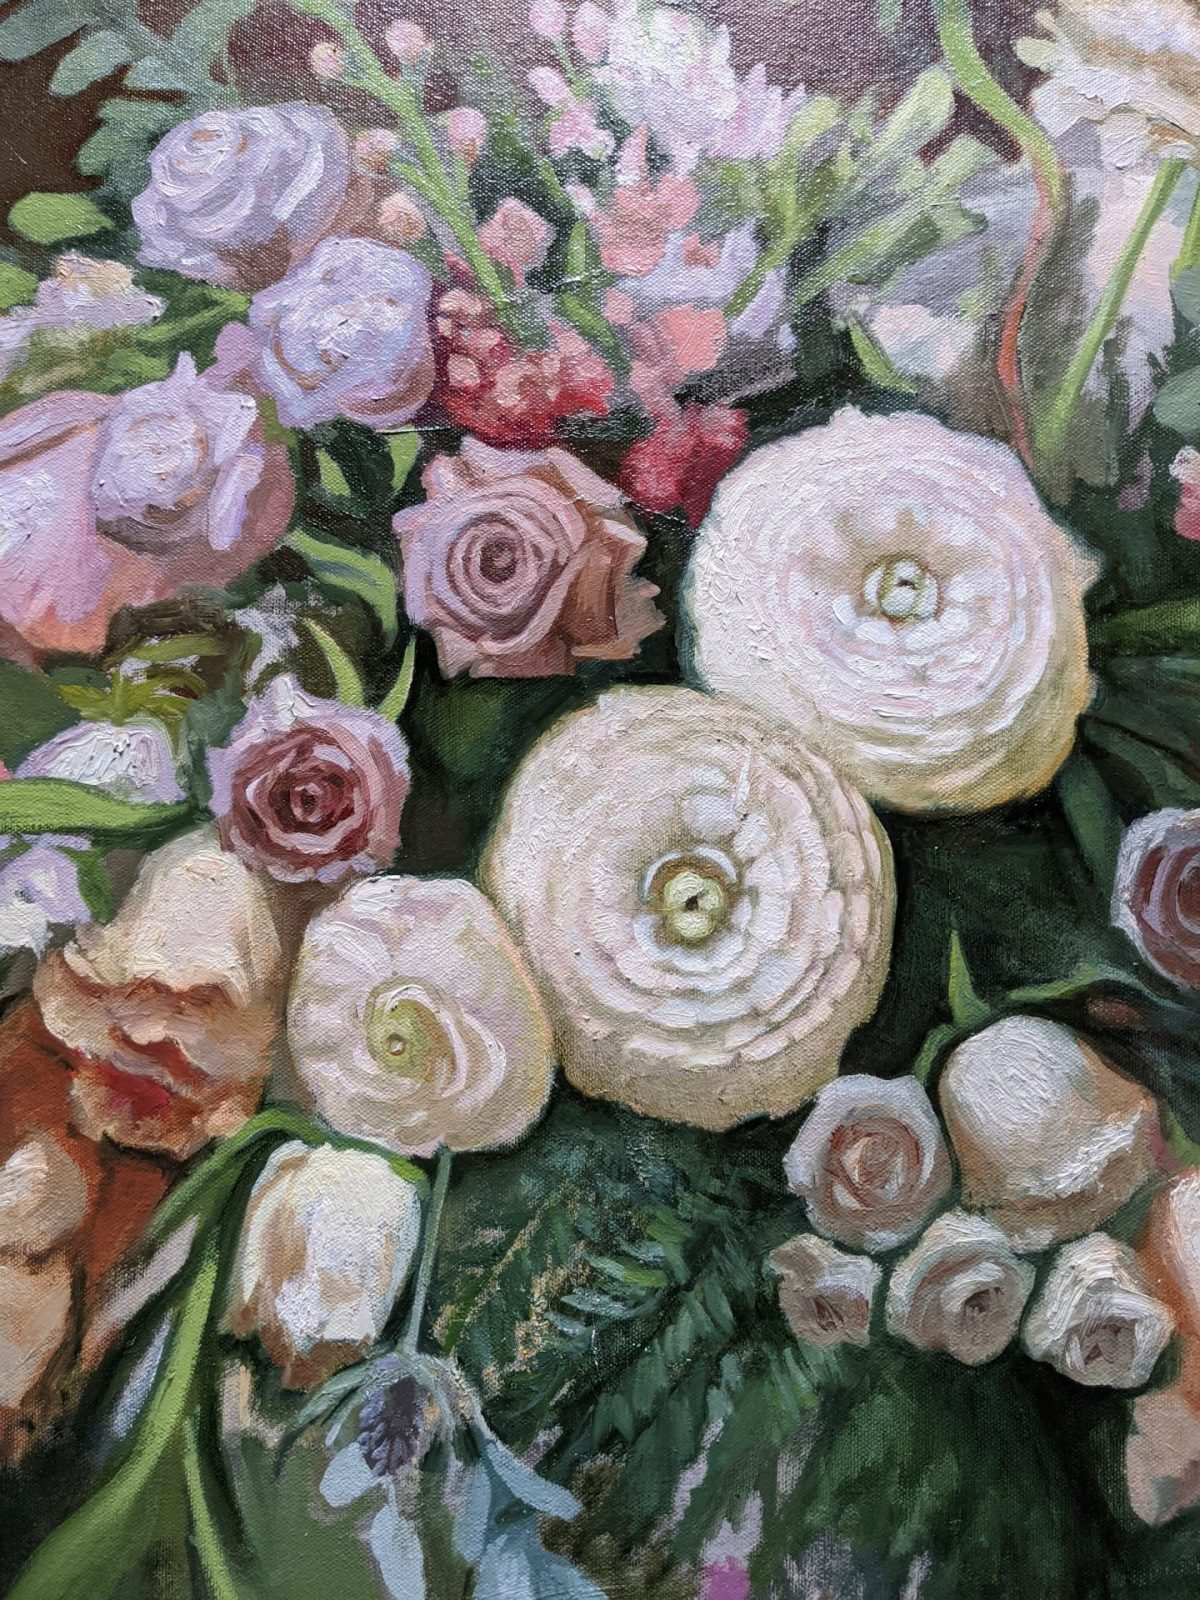 Arrangement-in-White-Oil-on-Canvas-24x30-Artist-Rebecca-King-Hawkinson-3600-sold-detail-3